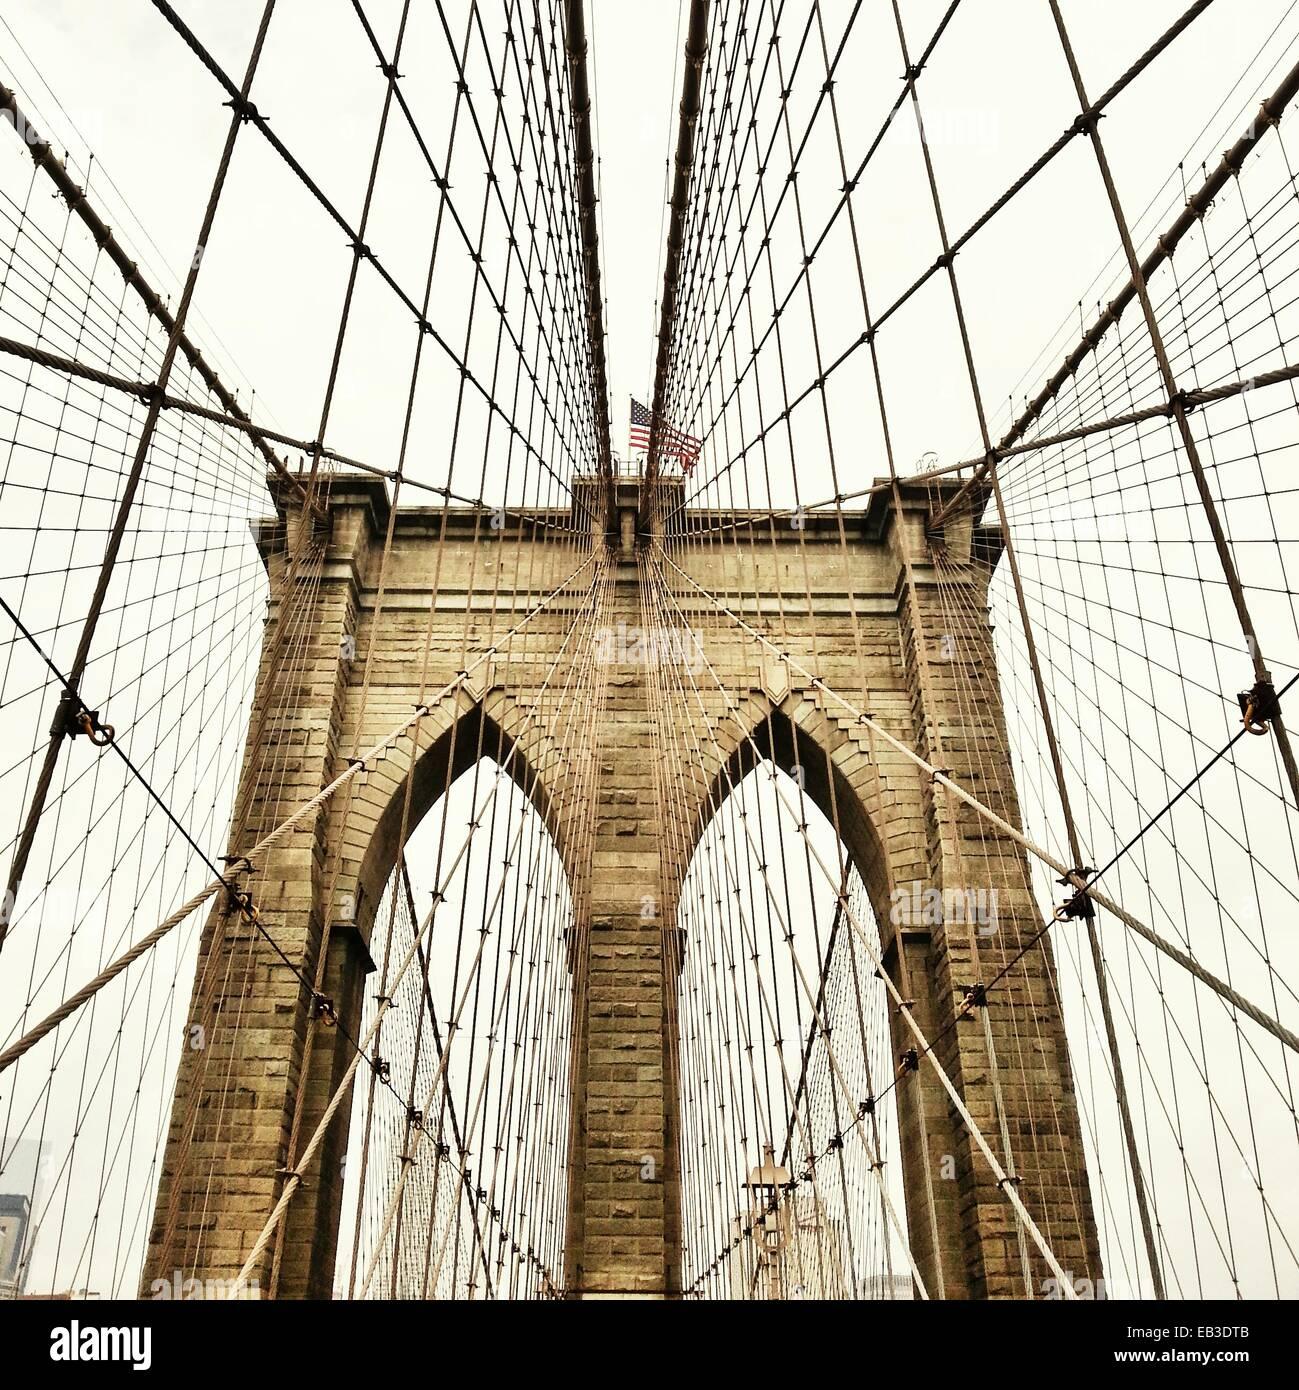 USA, New York State, New York City, Blick auf Brooklyn Bridge Stockbild